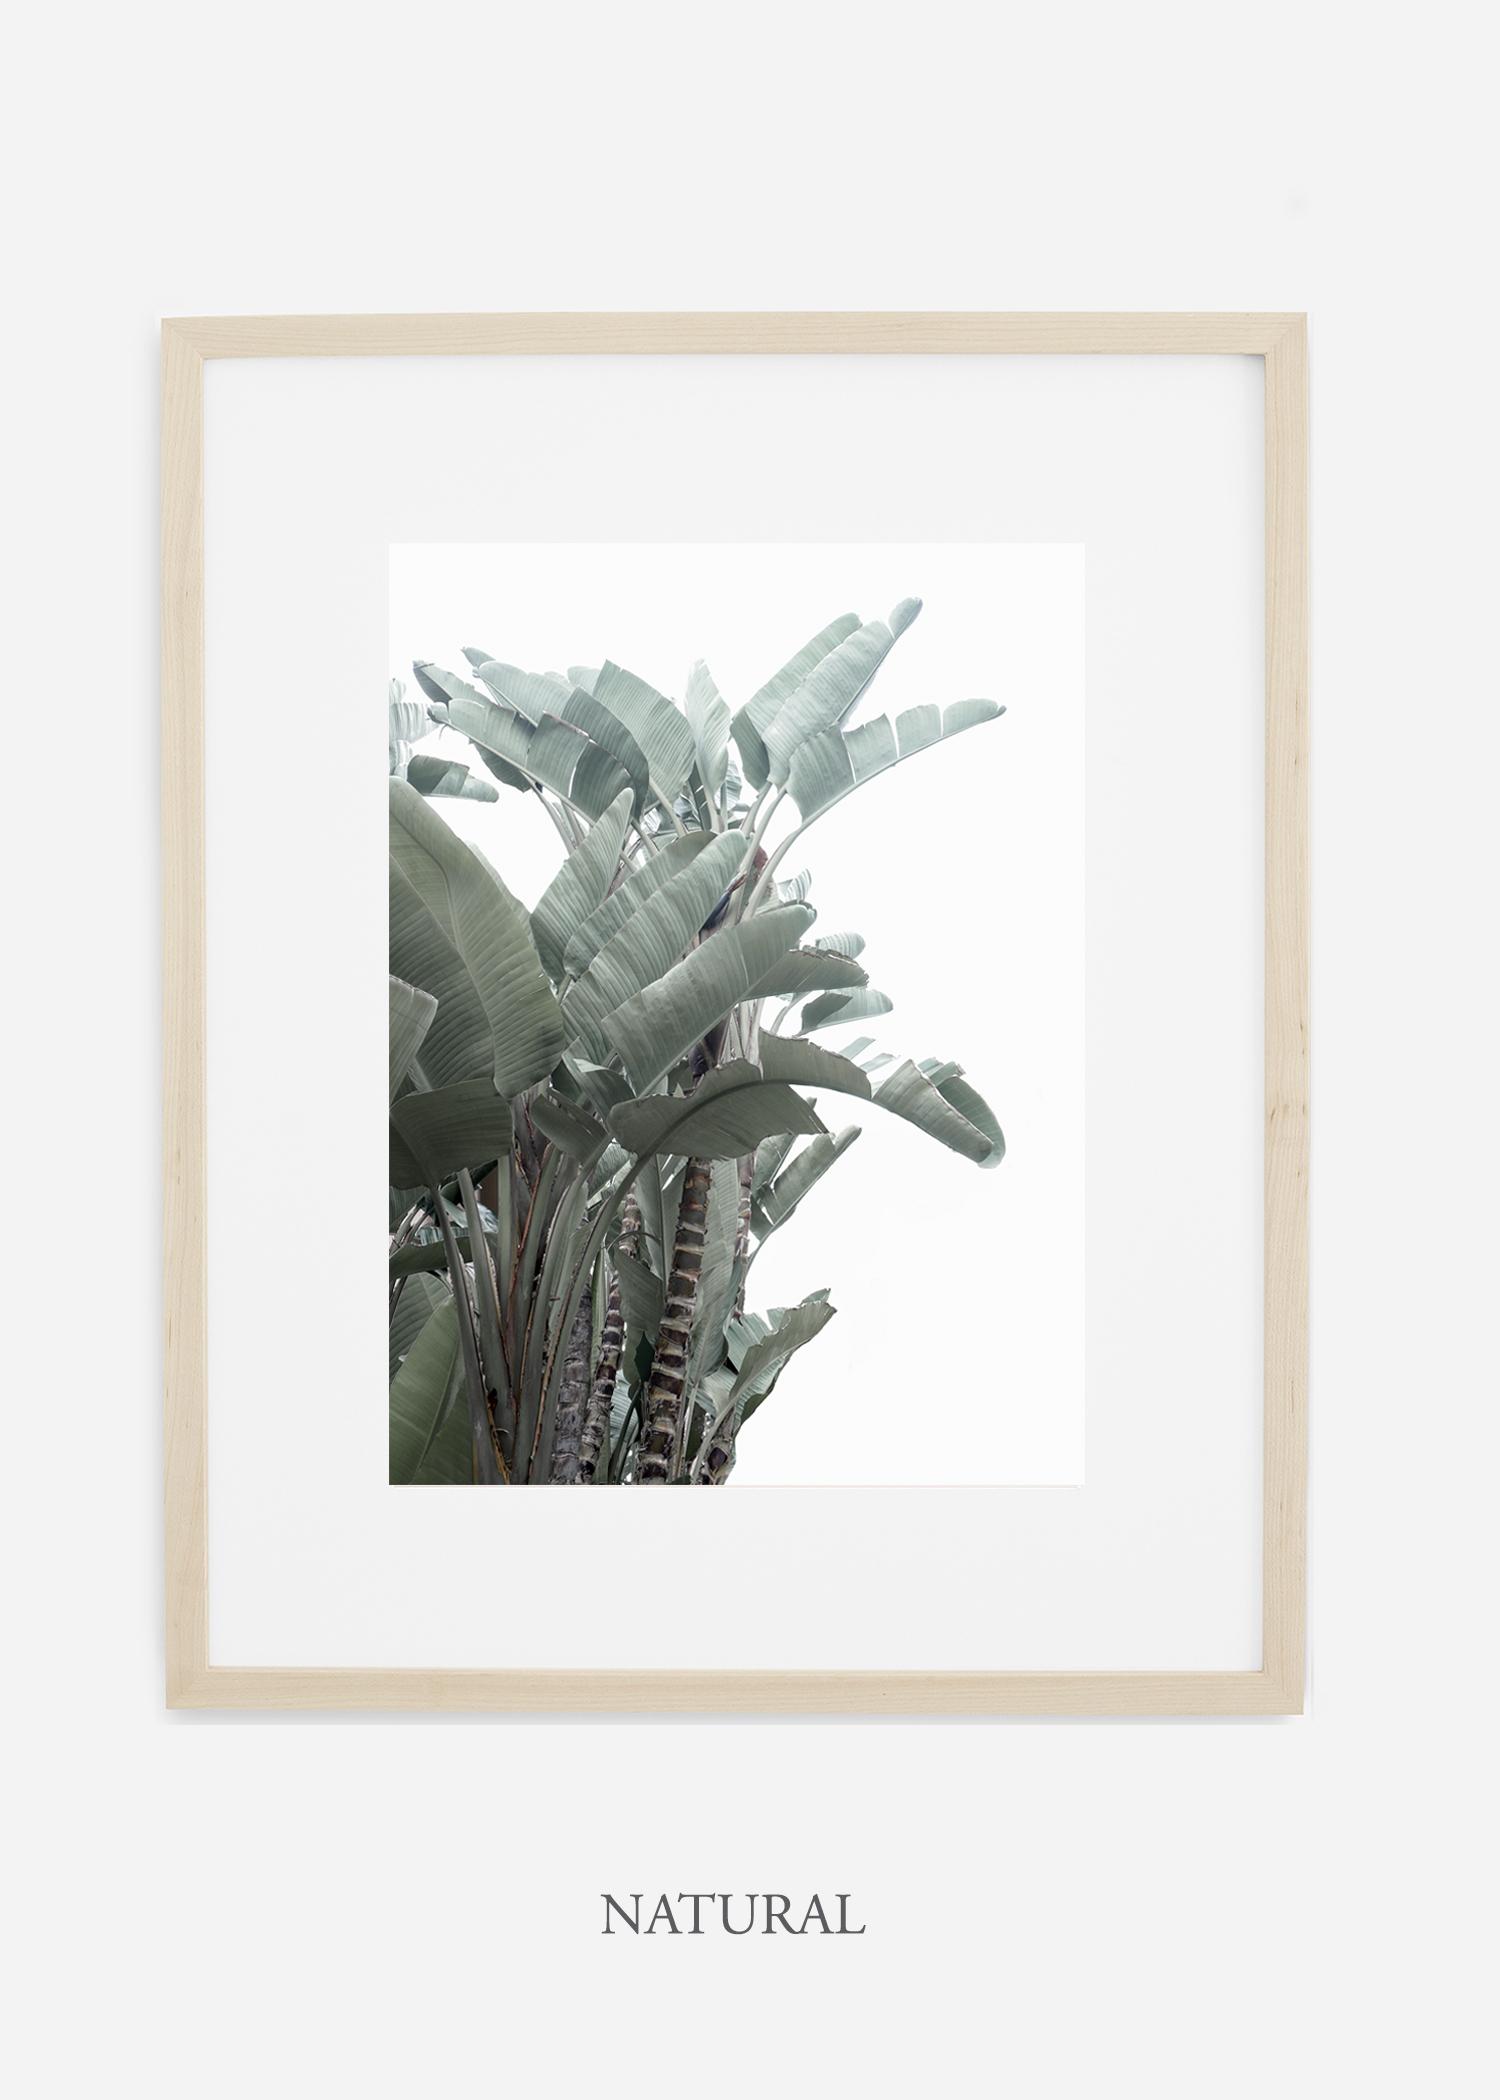 wildercalifornia_naturalframe_WinterWhite_BananaLeafNo.1_Tropical_LosAngeles_Art_HomeDecor_interiordesign_design.jpg